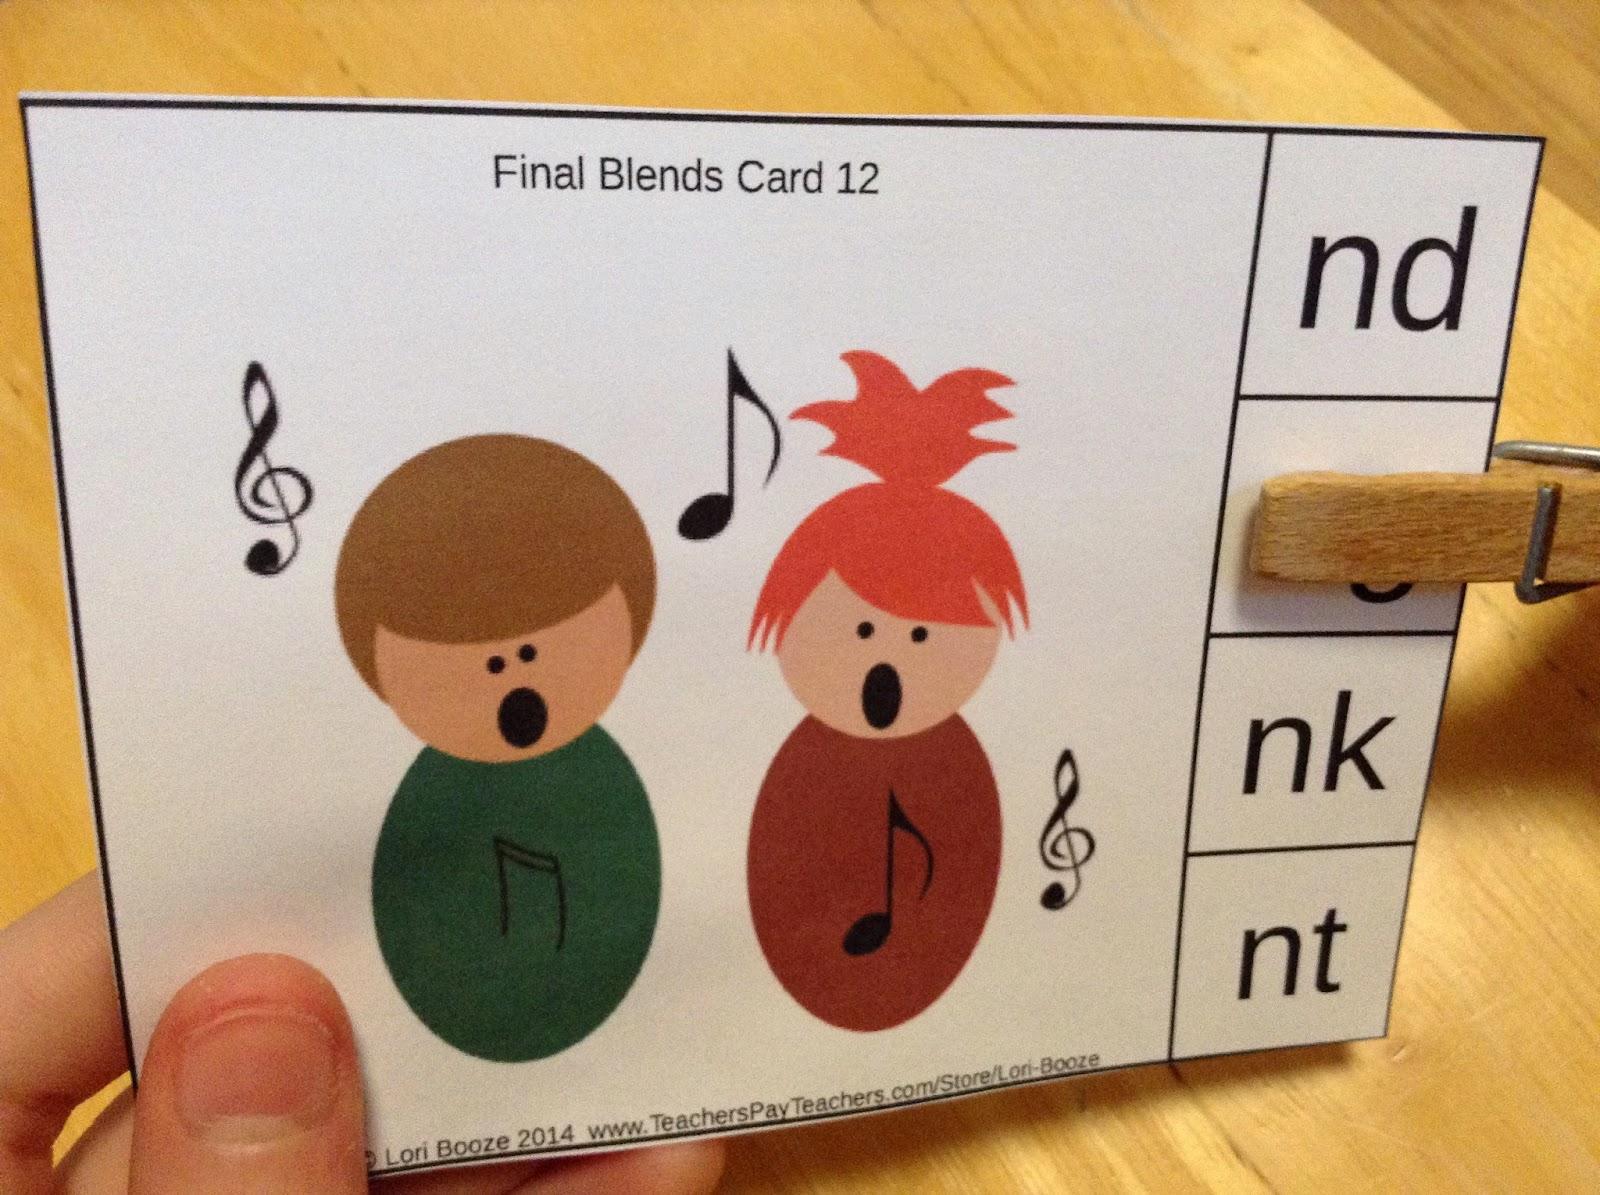 https://www.teacherspayteachers.com/Product/Final-Blends-Clip-Cards-nd-ng-nk-nt-Common-Core-Aligned-941370